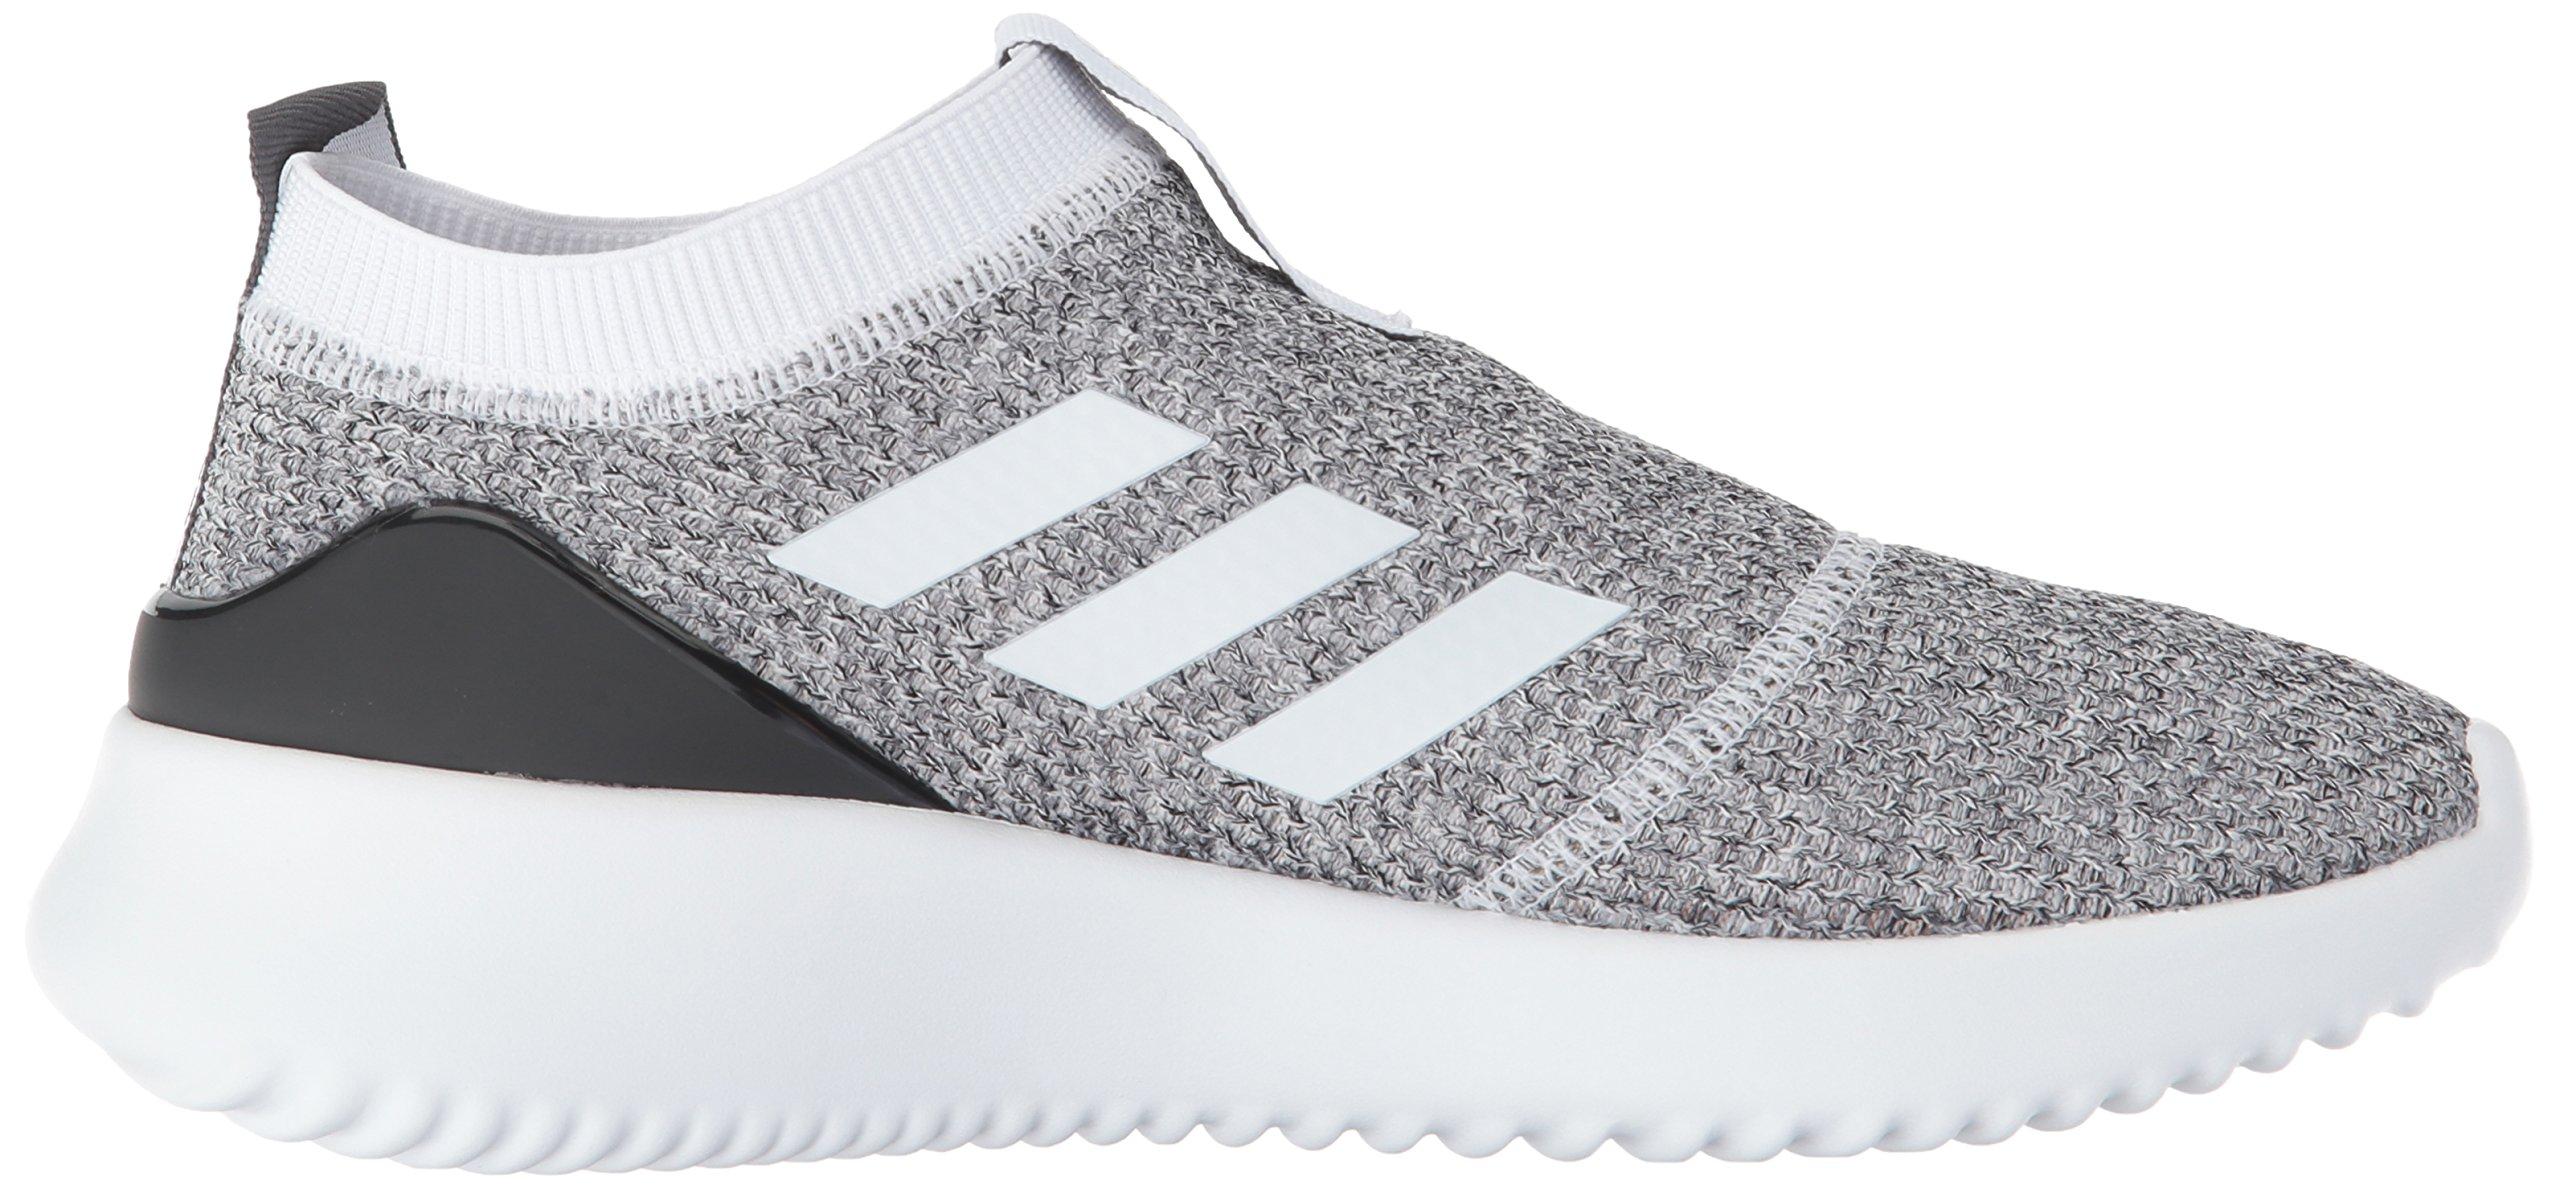 adidas Women's Ultimafusion Running Shoe, White/White/Black, 8 M US by adidas (Image #6)